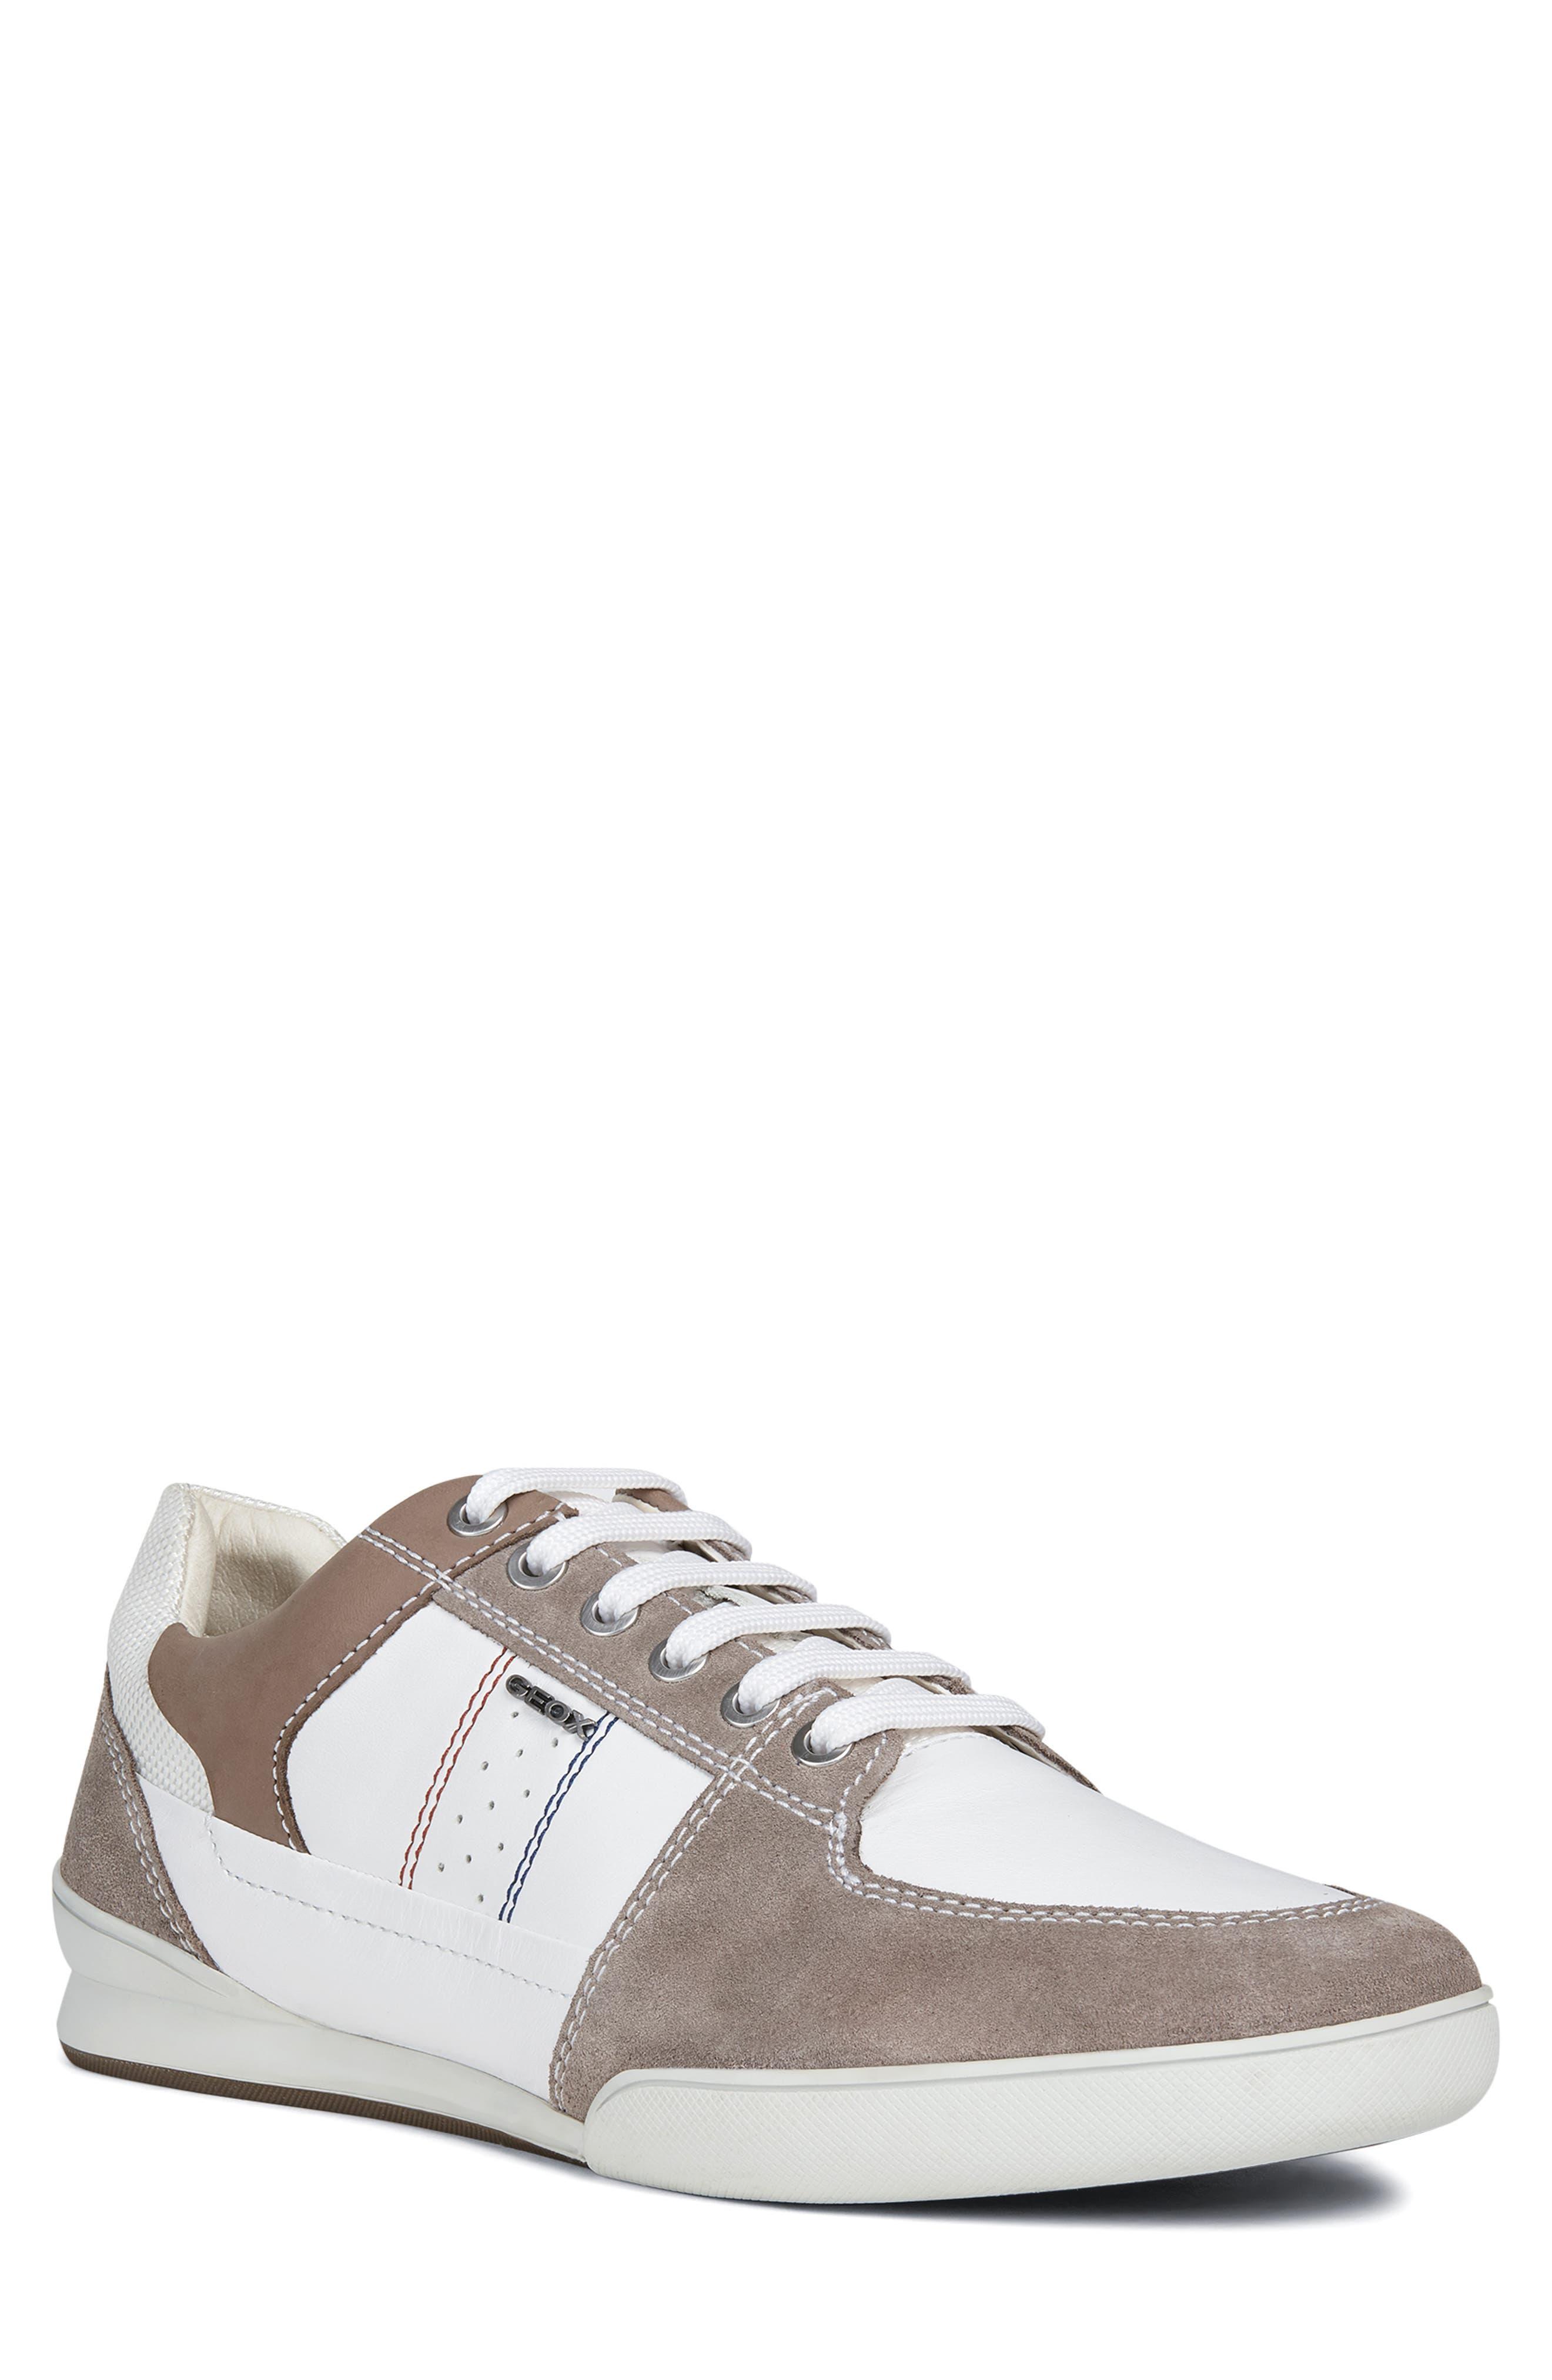 Geox Kristof 11 Sneaker, White